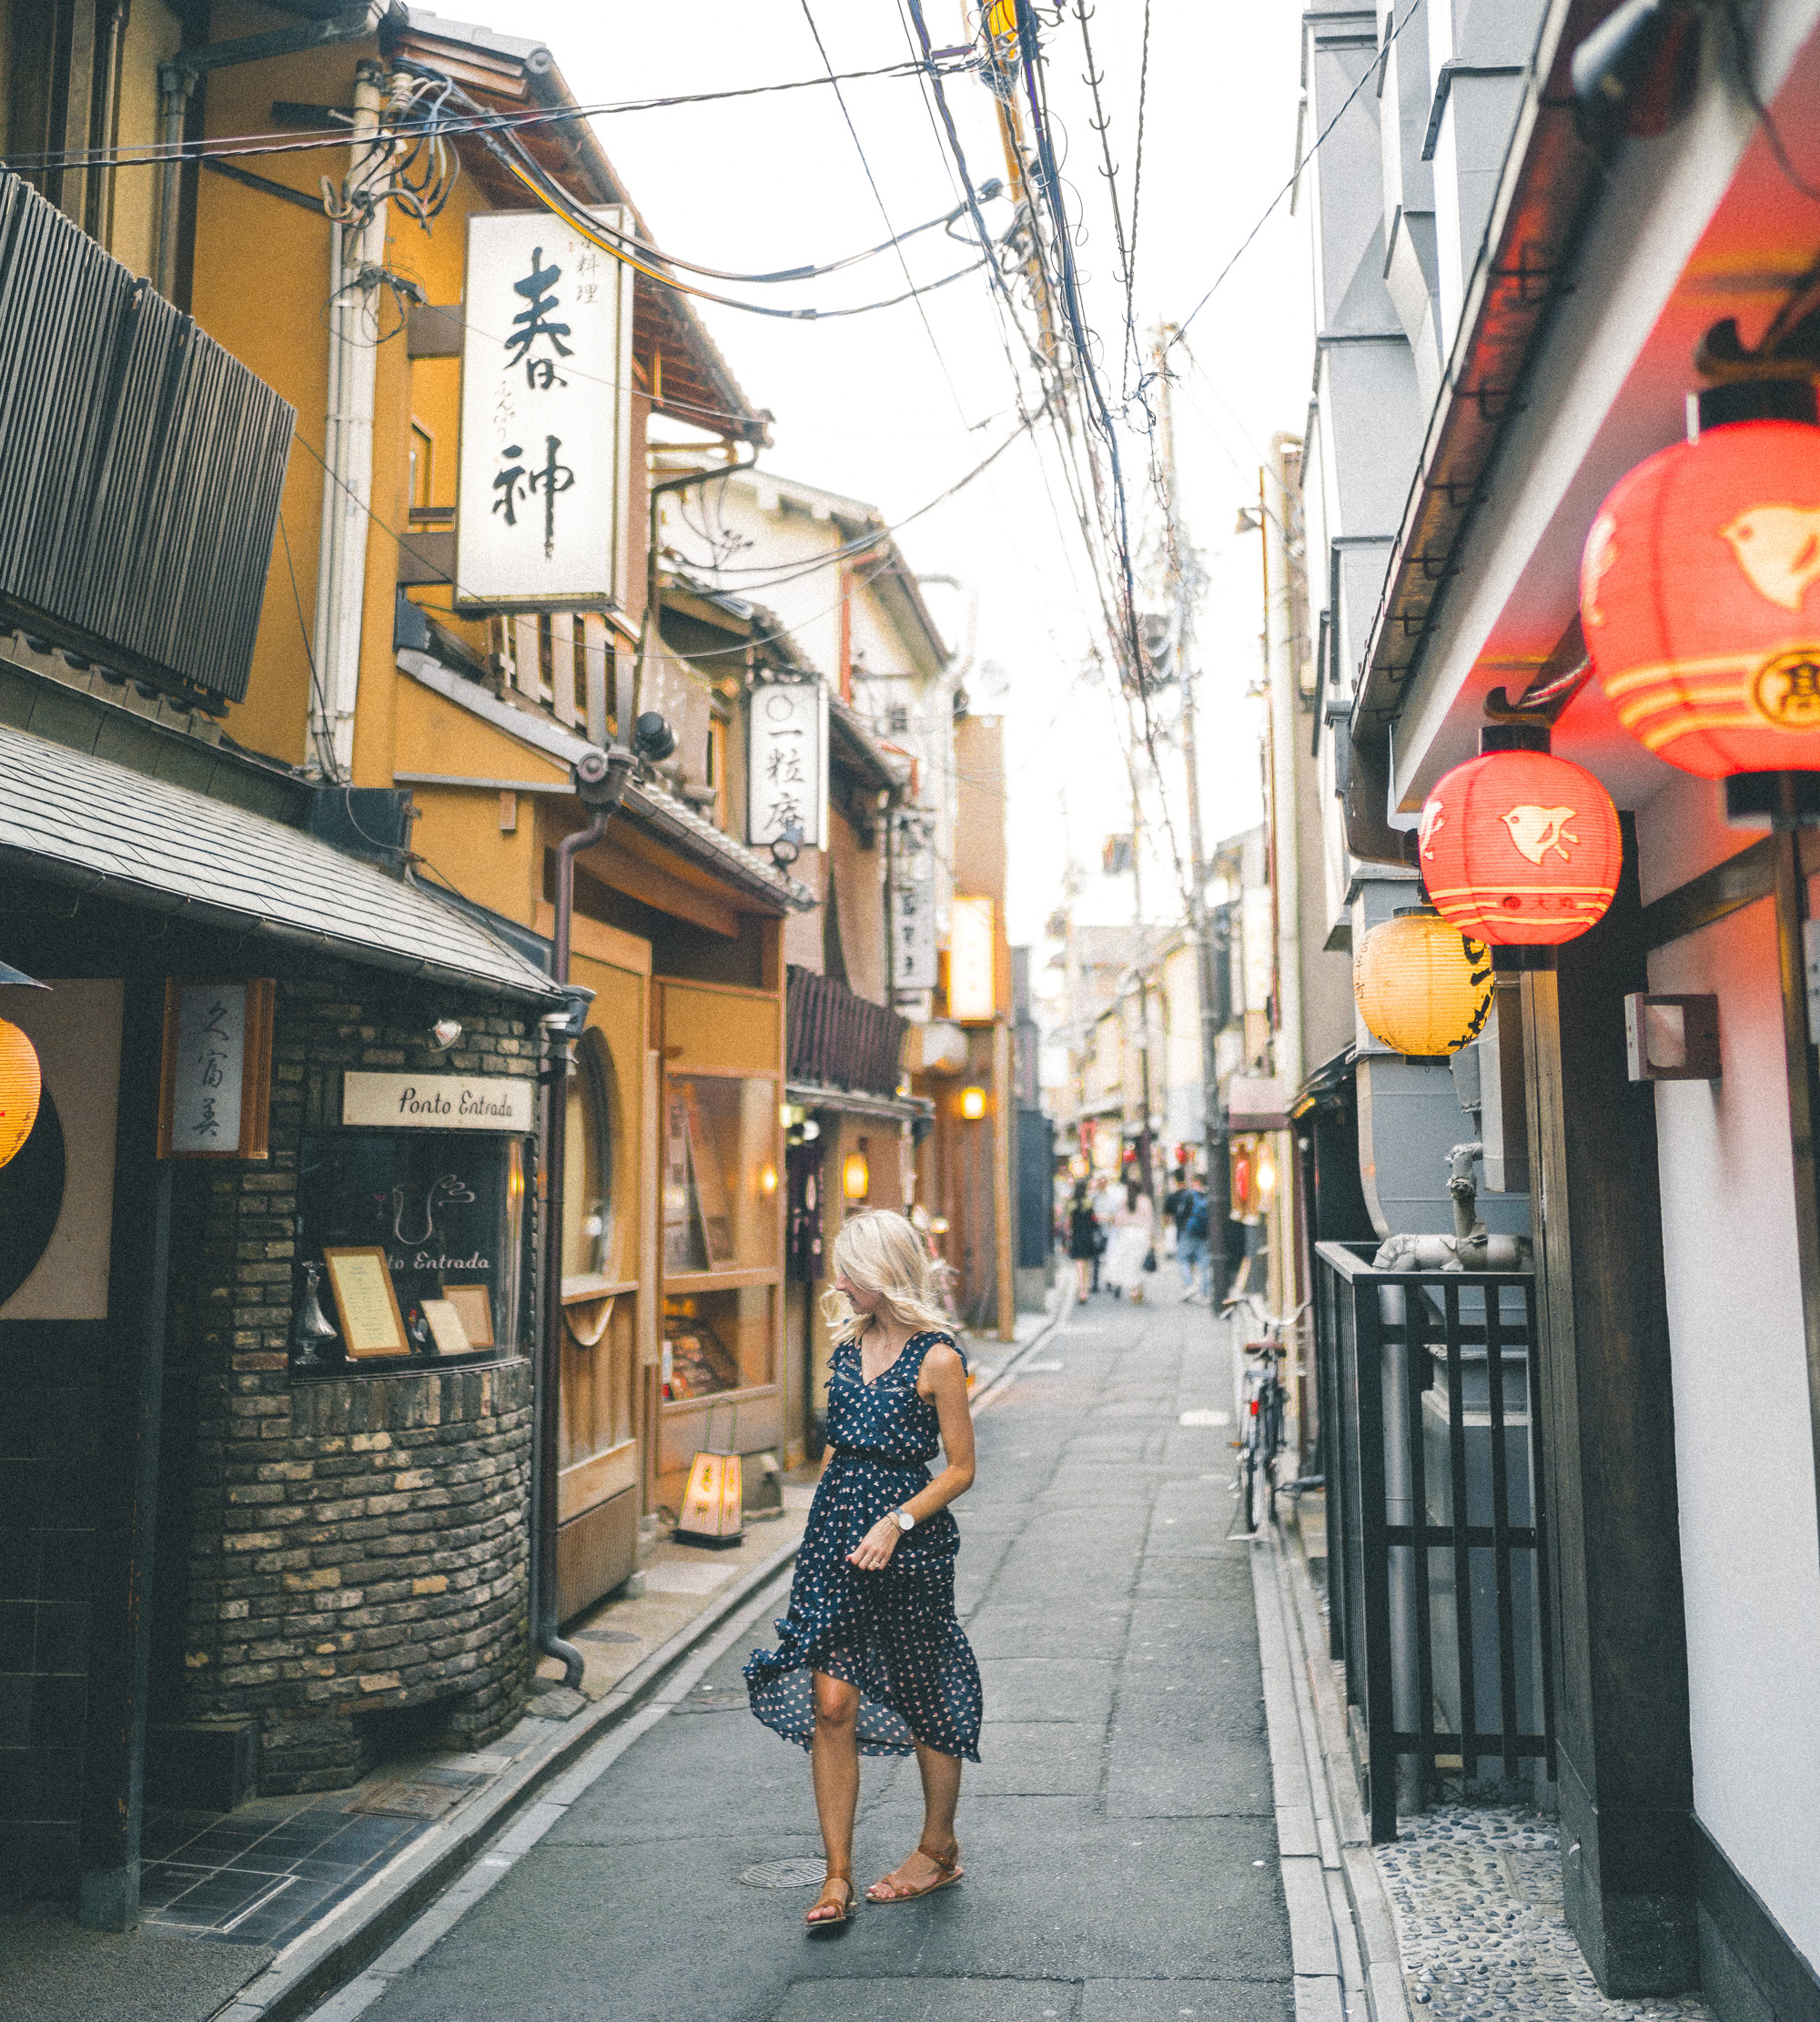 Tokyo-City-Japan-Complete-Travel-Guide-Shinjuku-Shibuya-02822.jpg